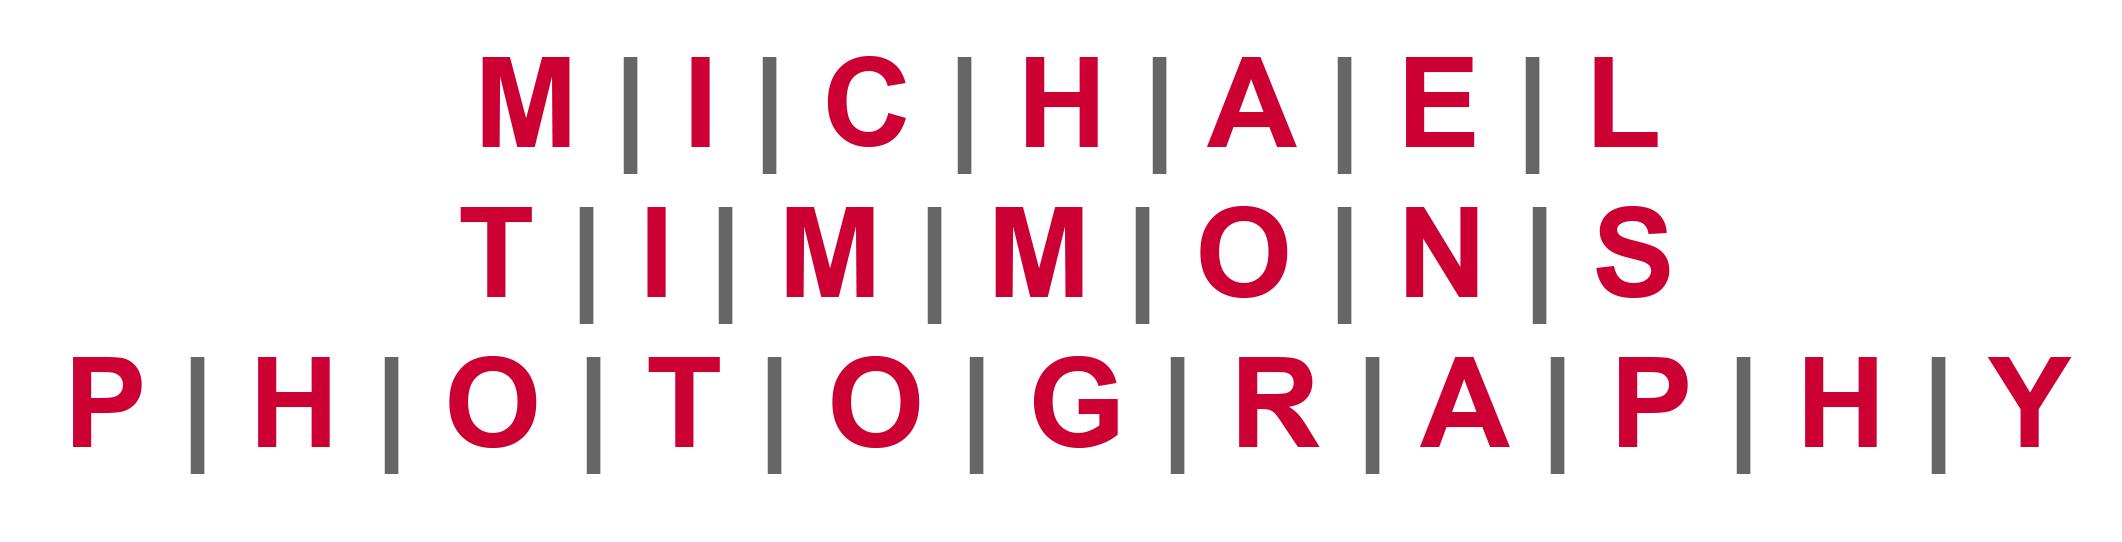 Michael_Timmons_Photography_Logo